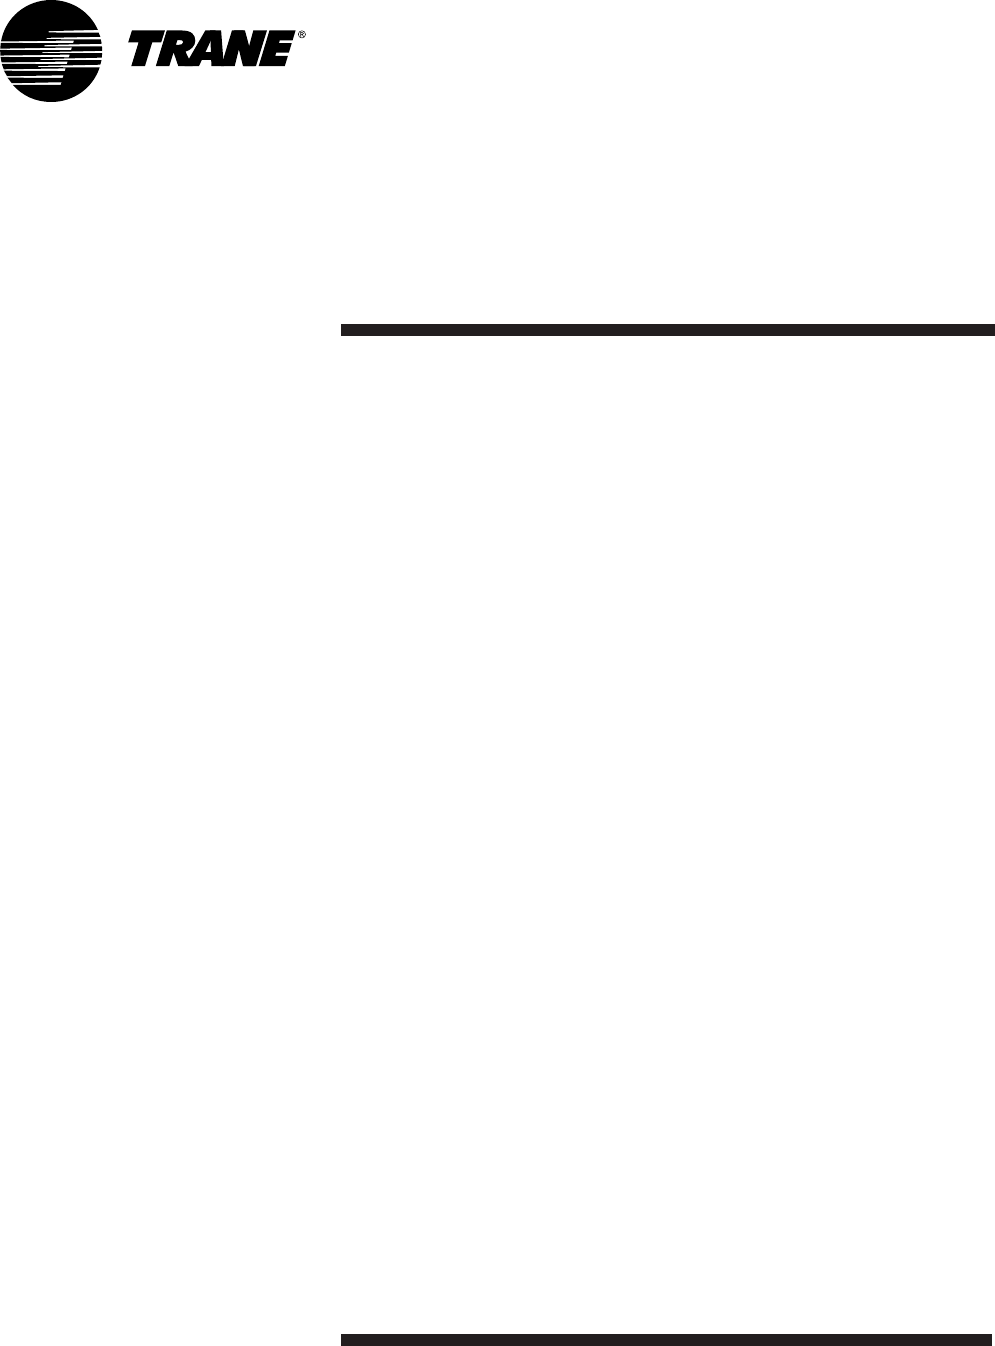 Trane RT-SVX19A-E4 manual